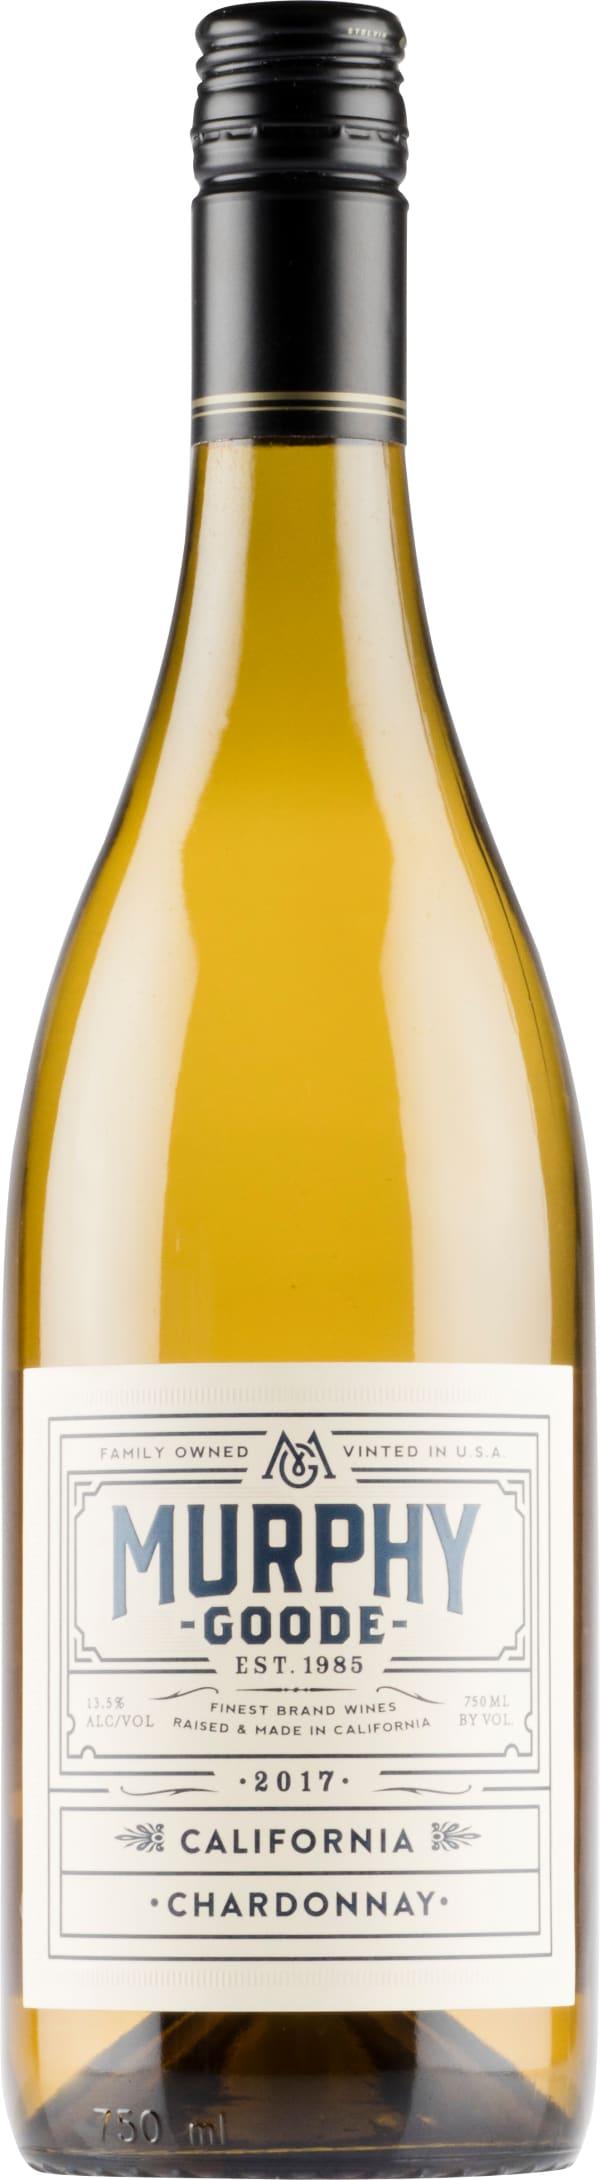 Murphy Goode Chardonnay 2017